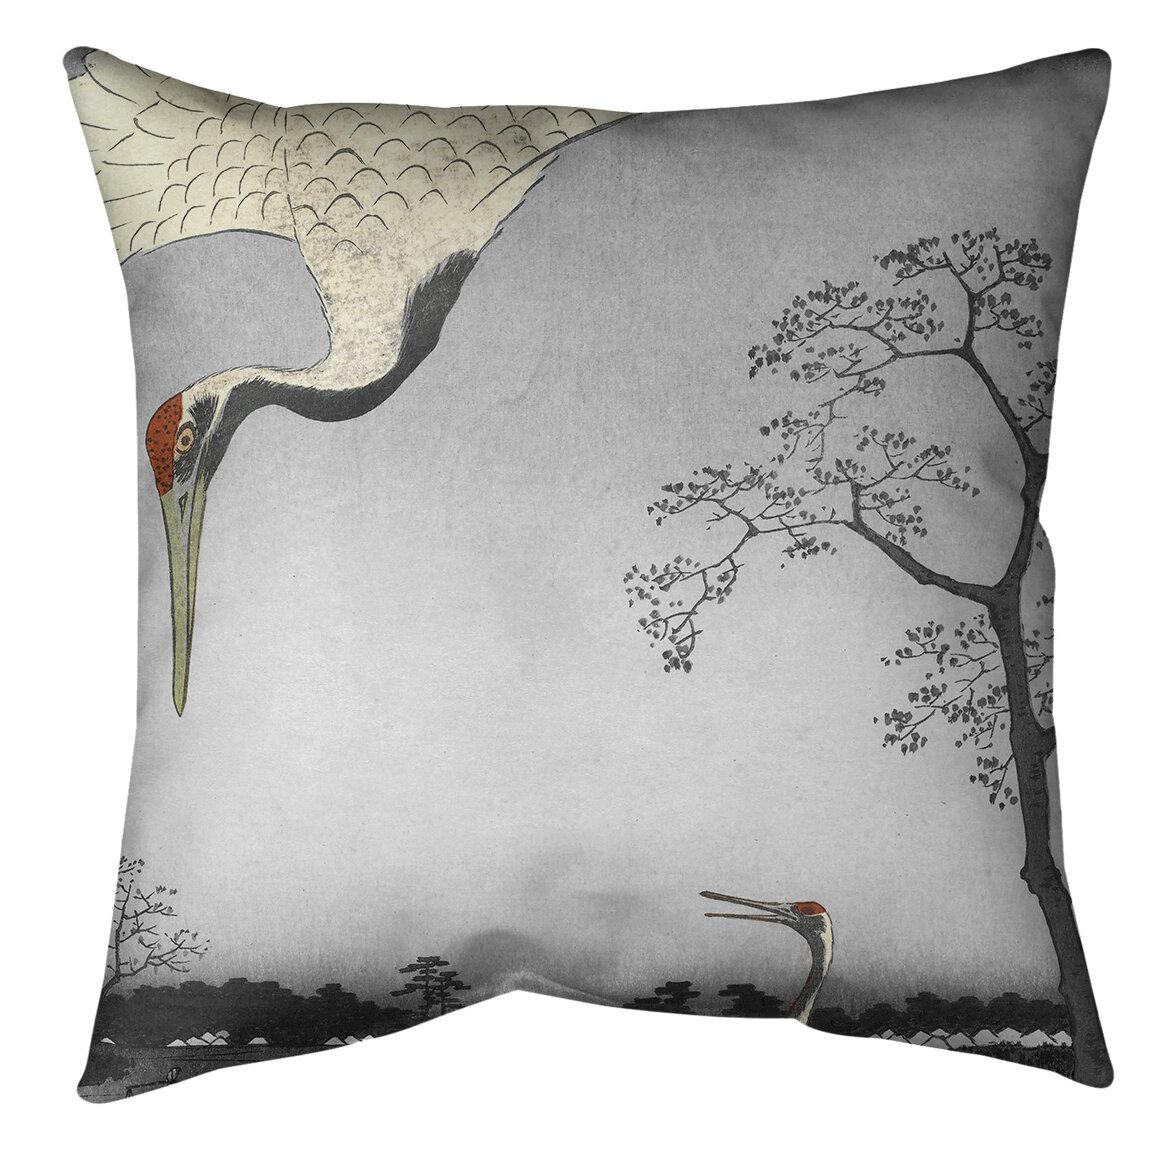 East Urban Home Japanese Cranes Throw Pillow Reviews Wayfair